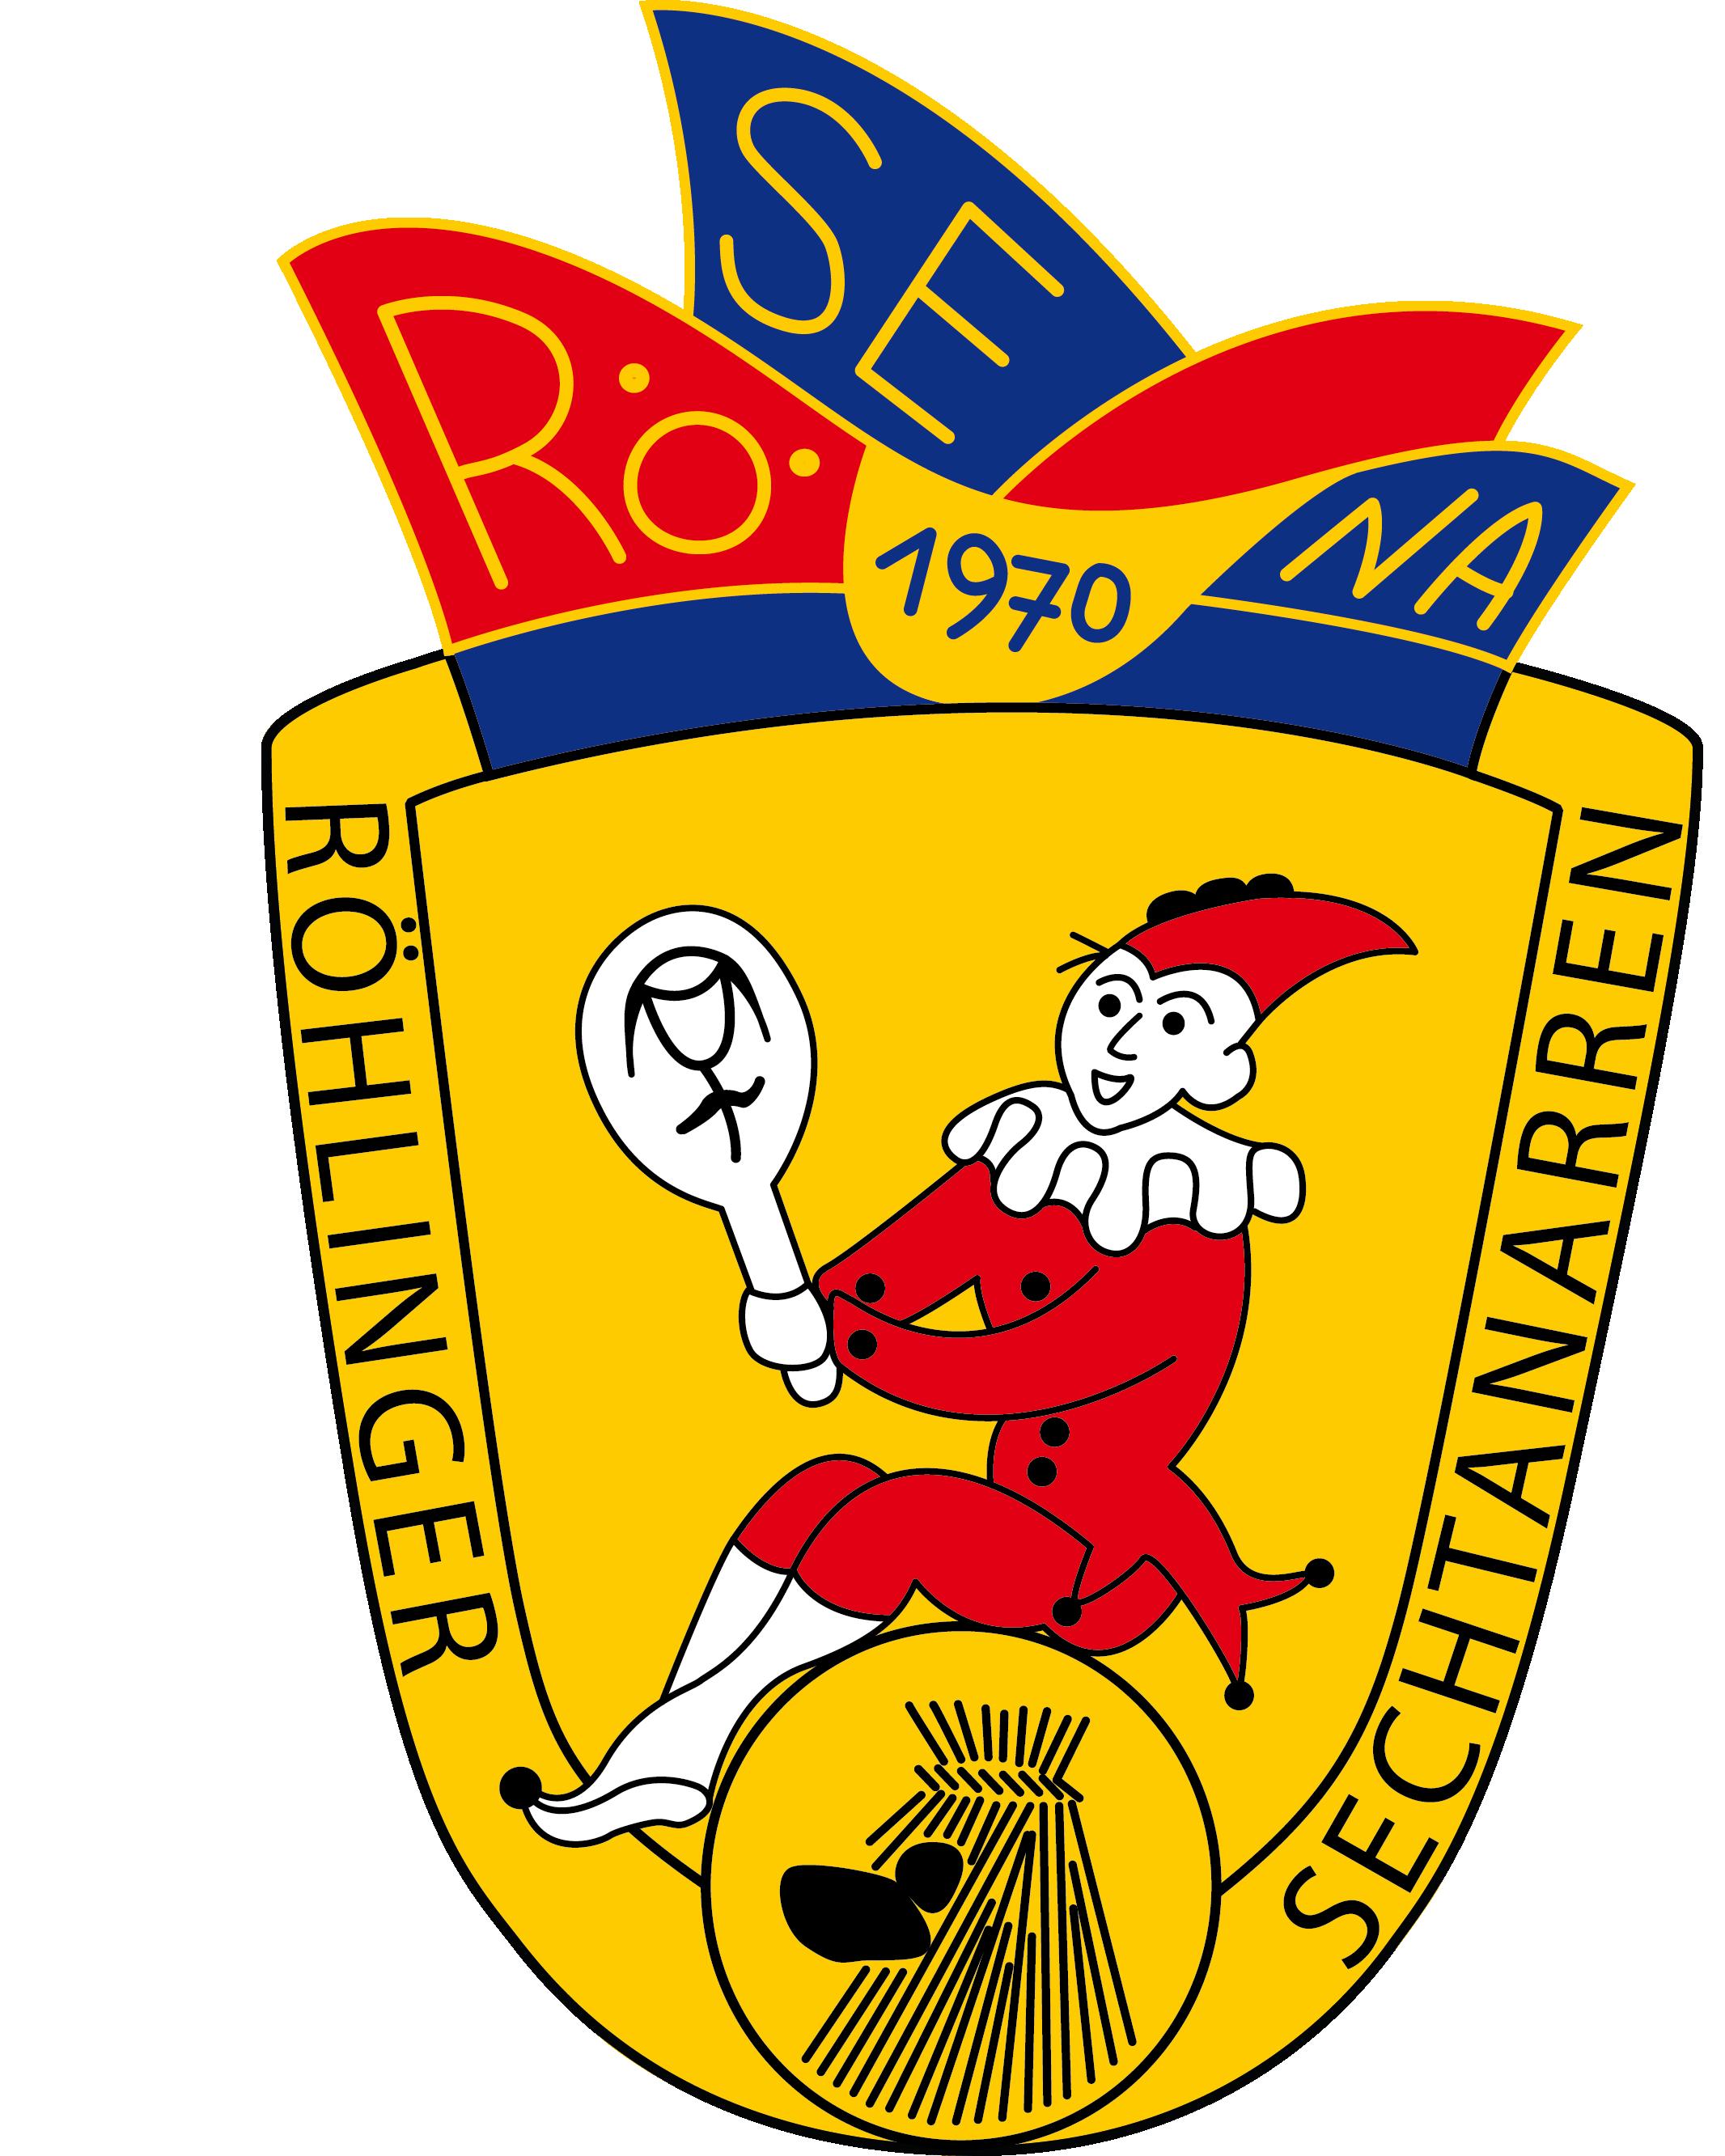 Faschings-Gesellschaft Röhlinger-Sechta- Narren e.V.